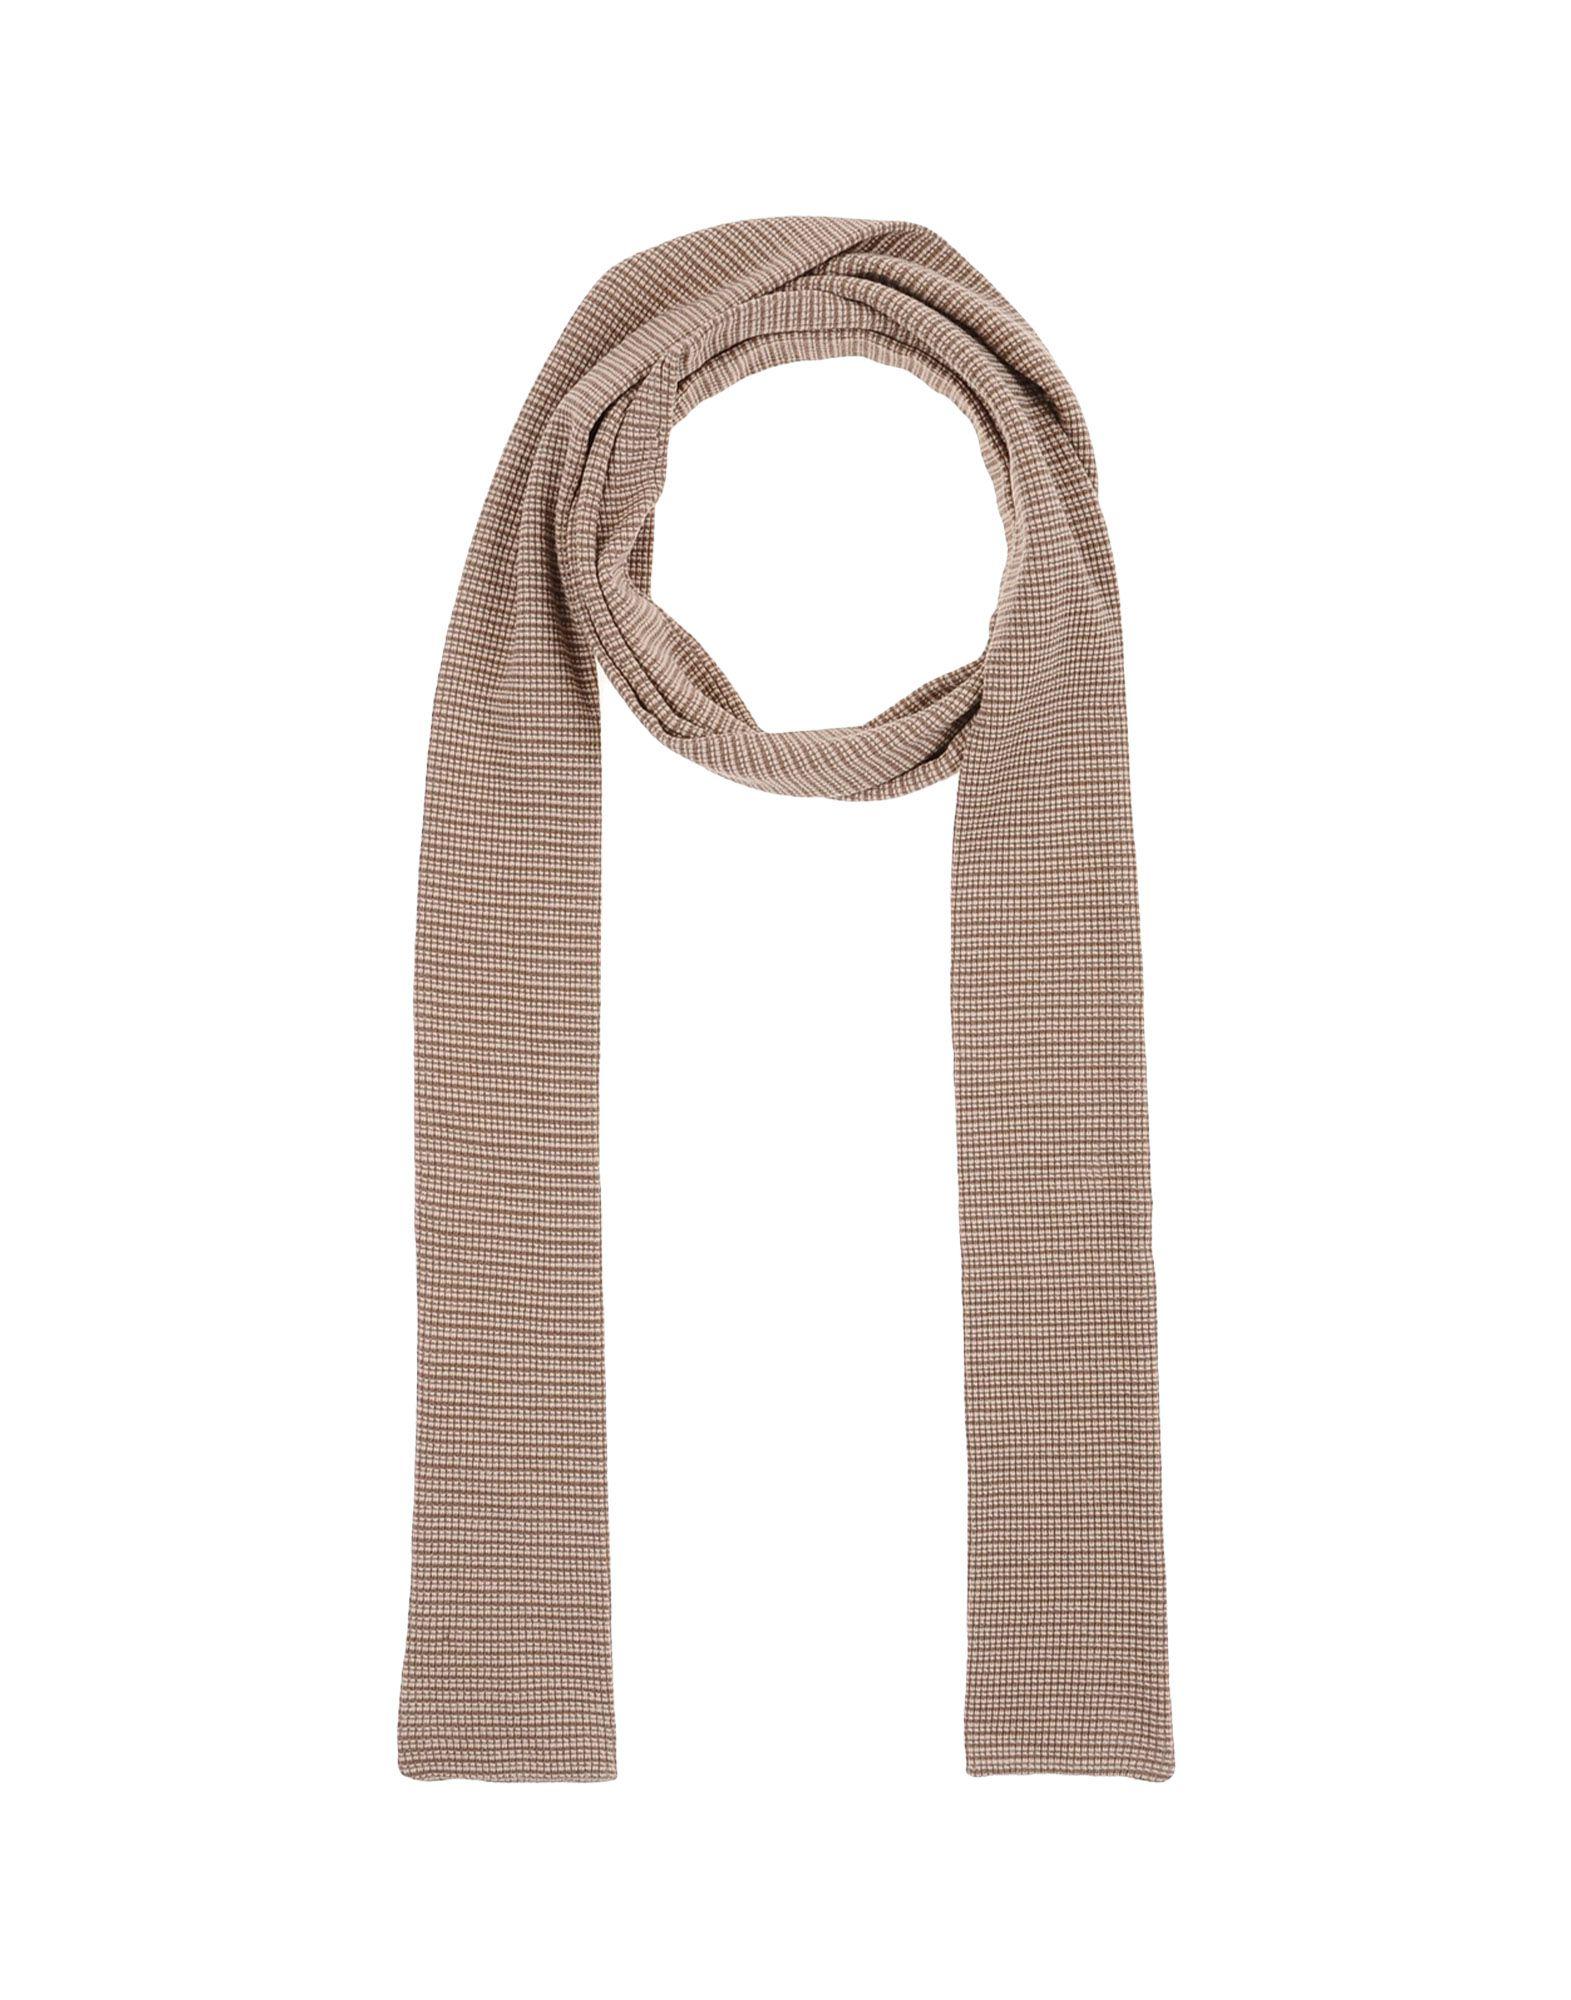 marc jacobs female marc jacobs oblong scarves